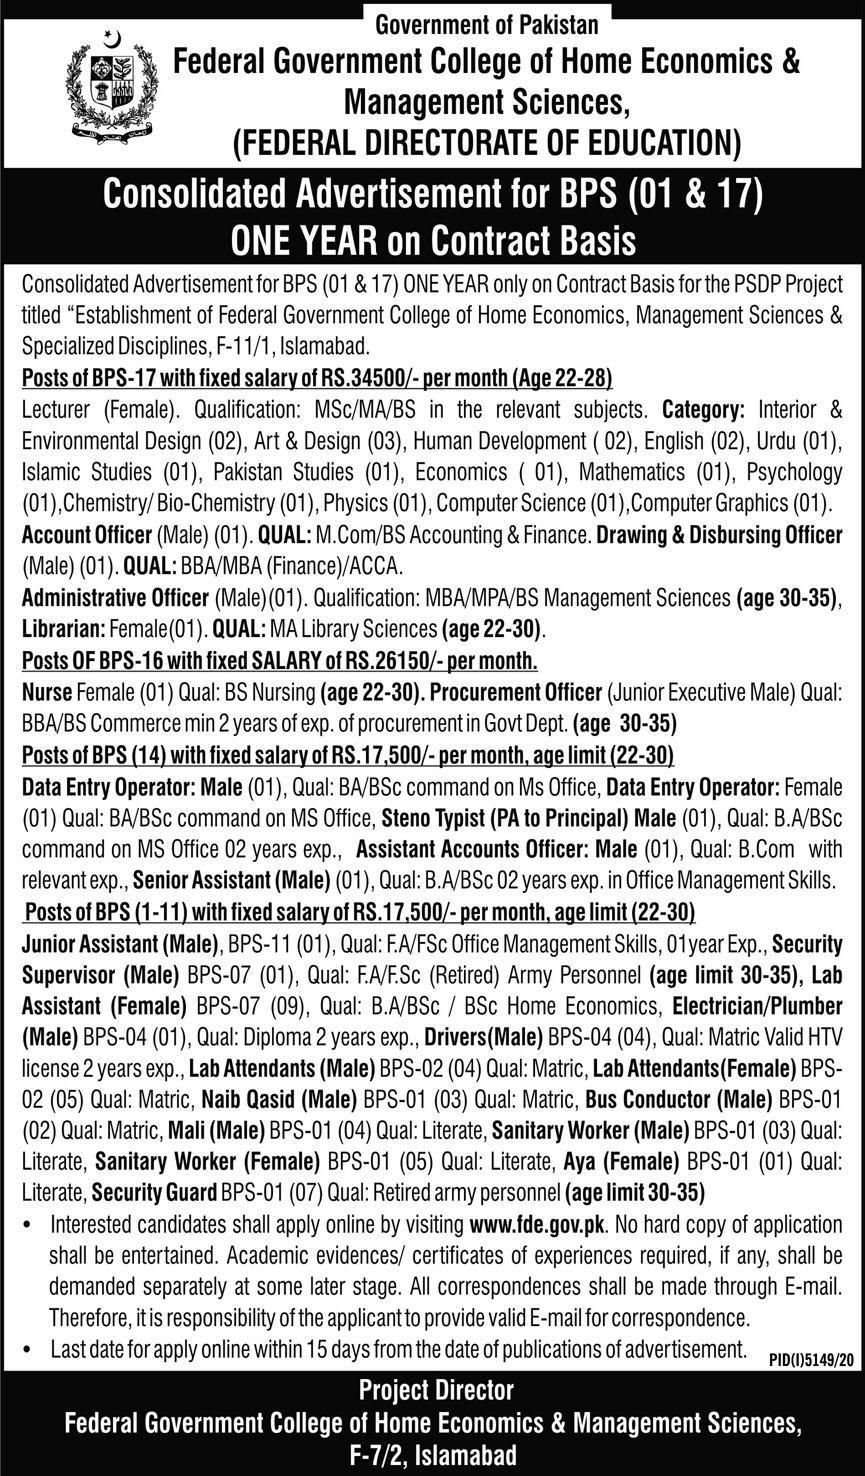 fde.gov.pk - Online FDE Job Application Form - Federal Directorate of Education Jobs 2021 in Pakistan